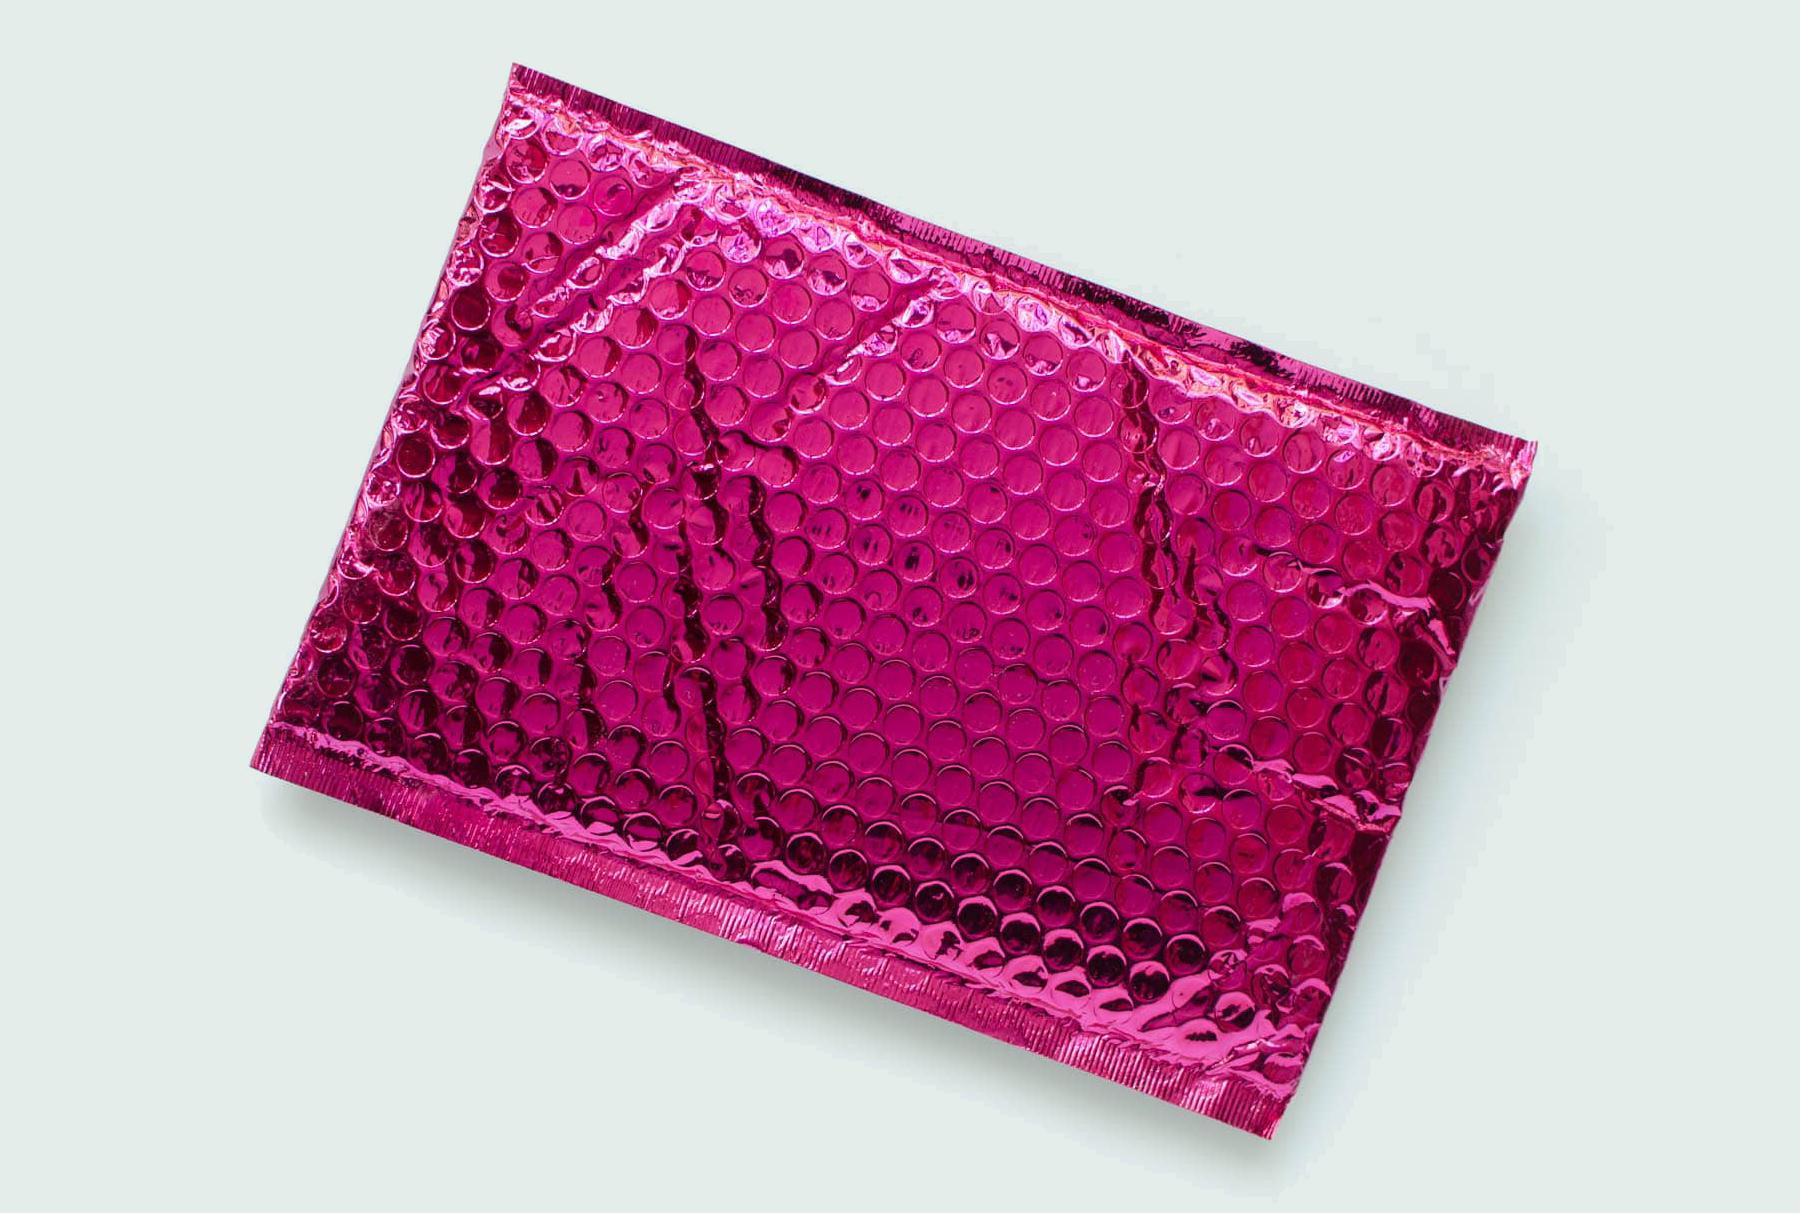 Pink metallic package